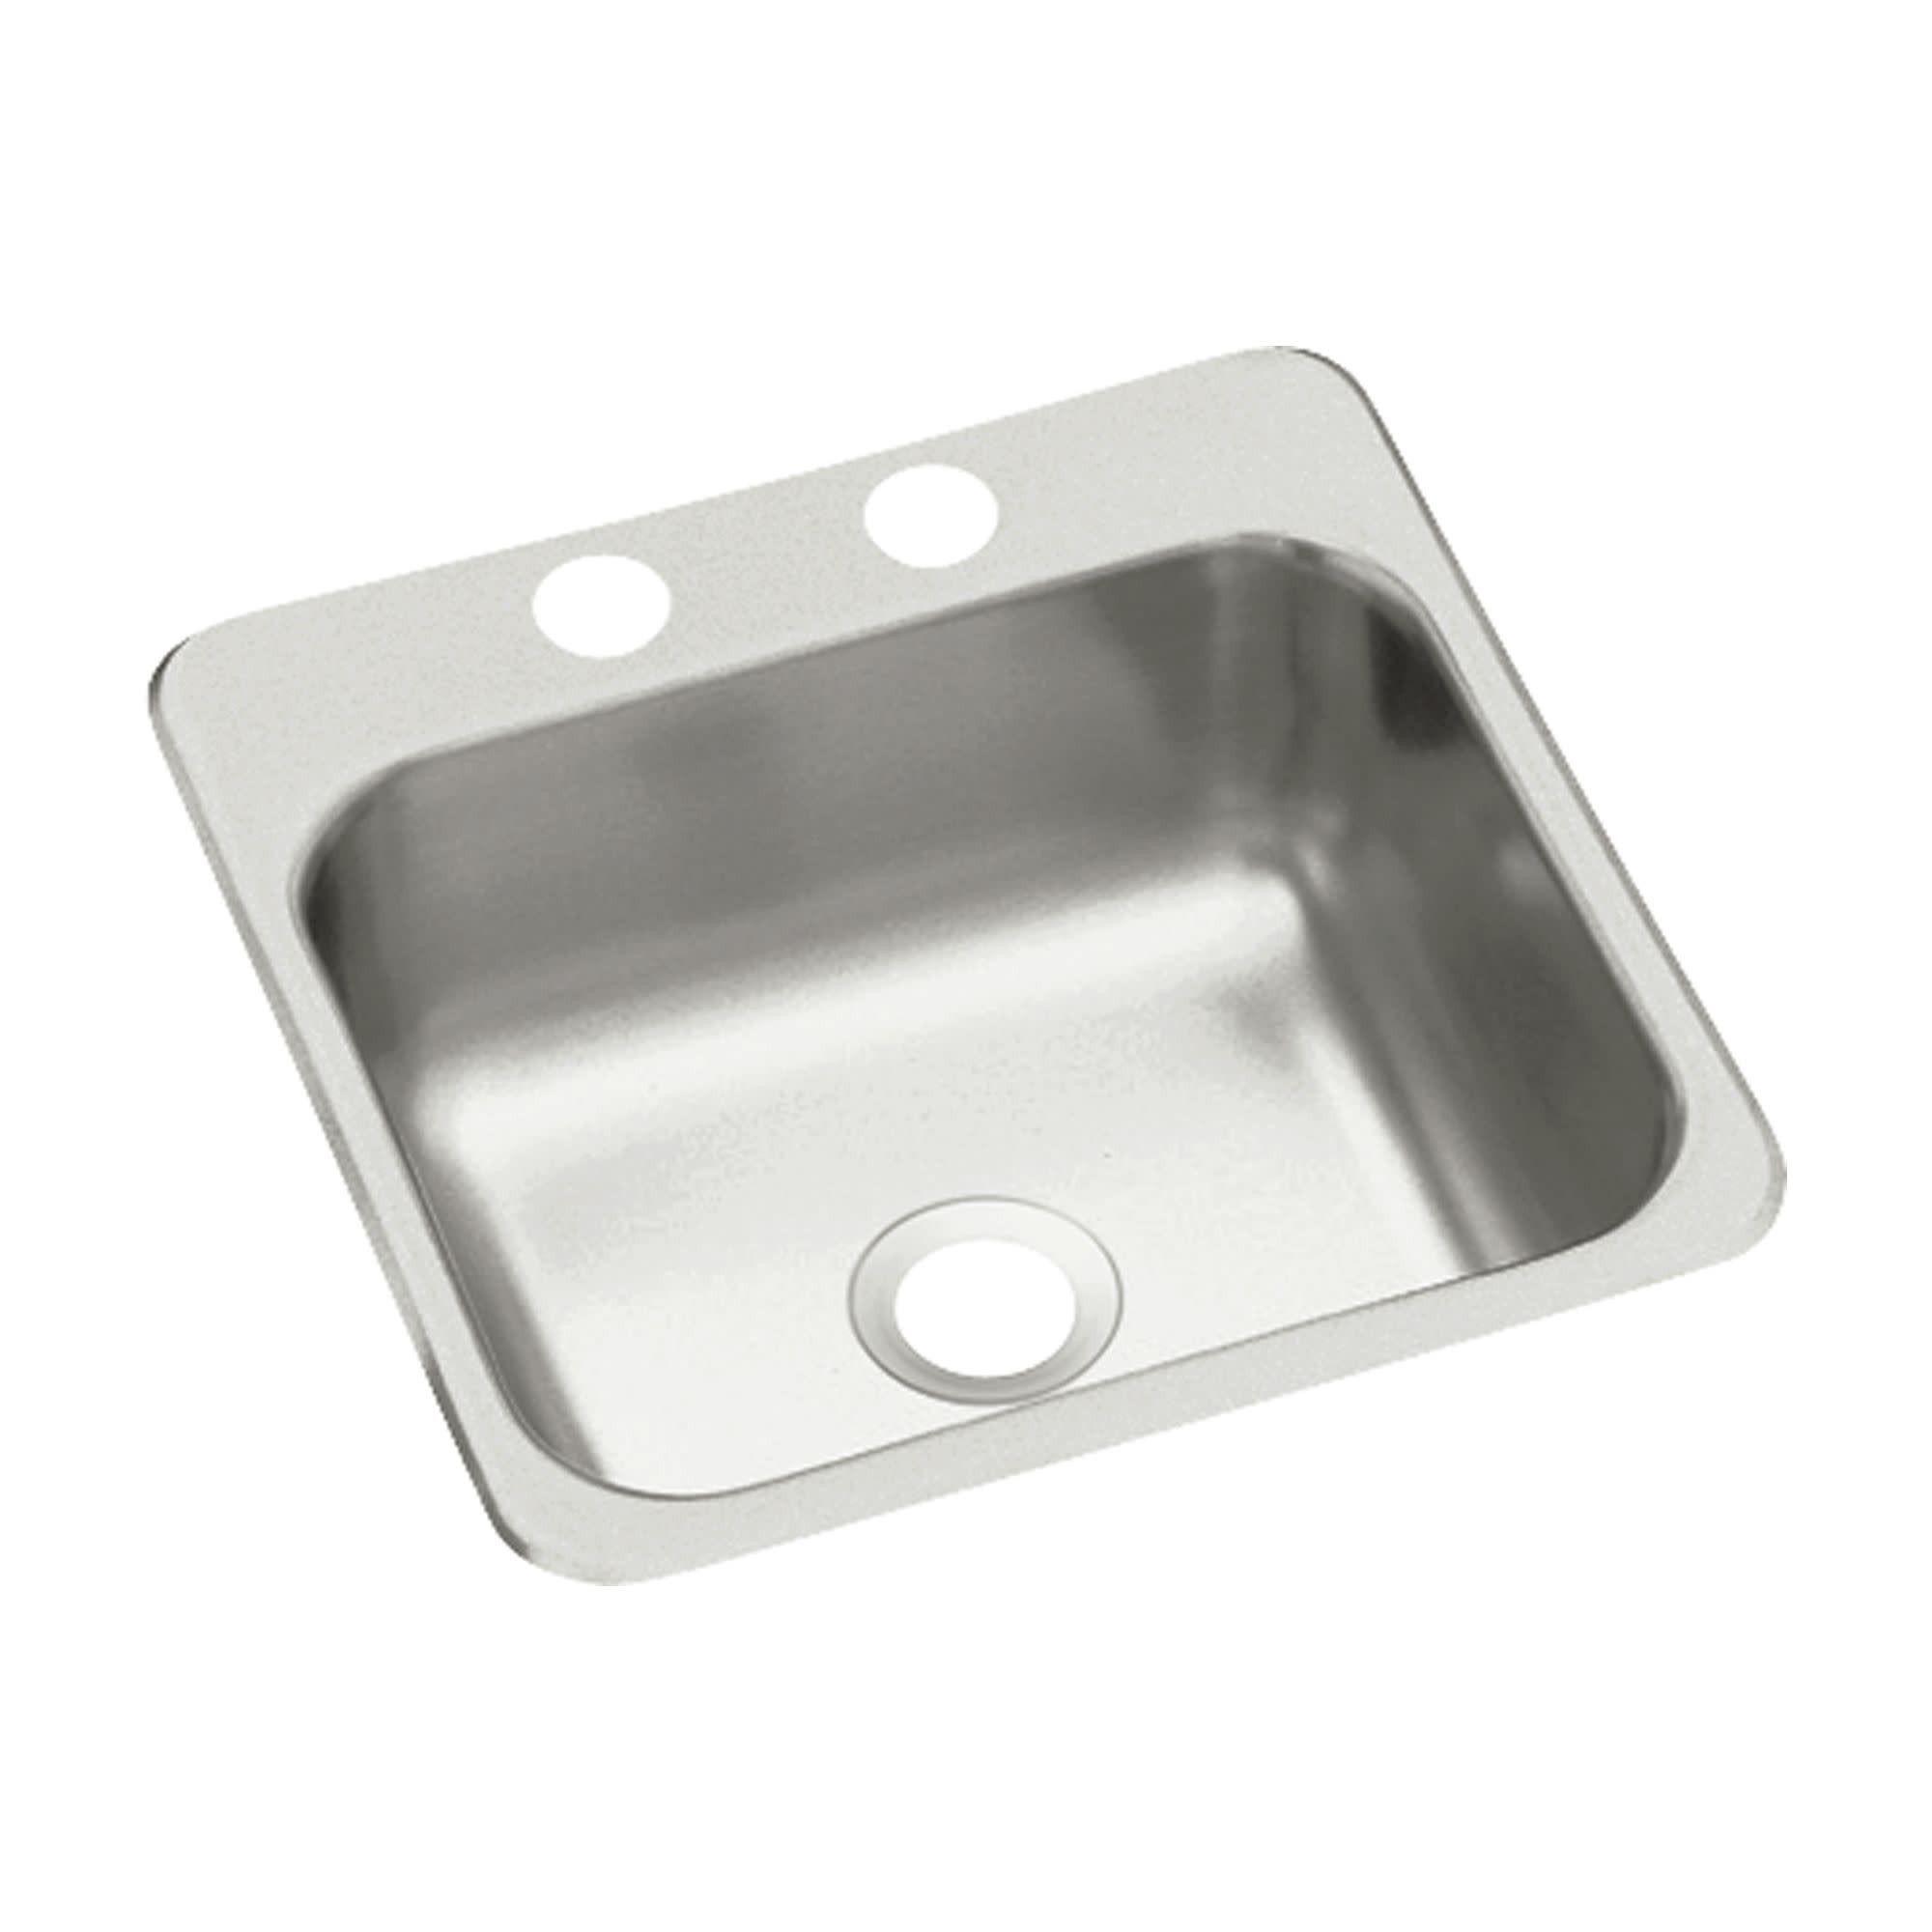 Sterling B153 2 15 Single Basin Drop In Stainless Steel Silver